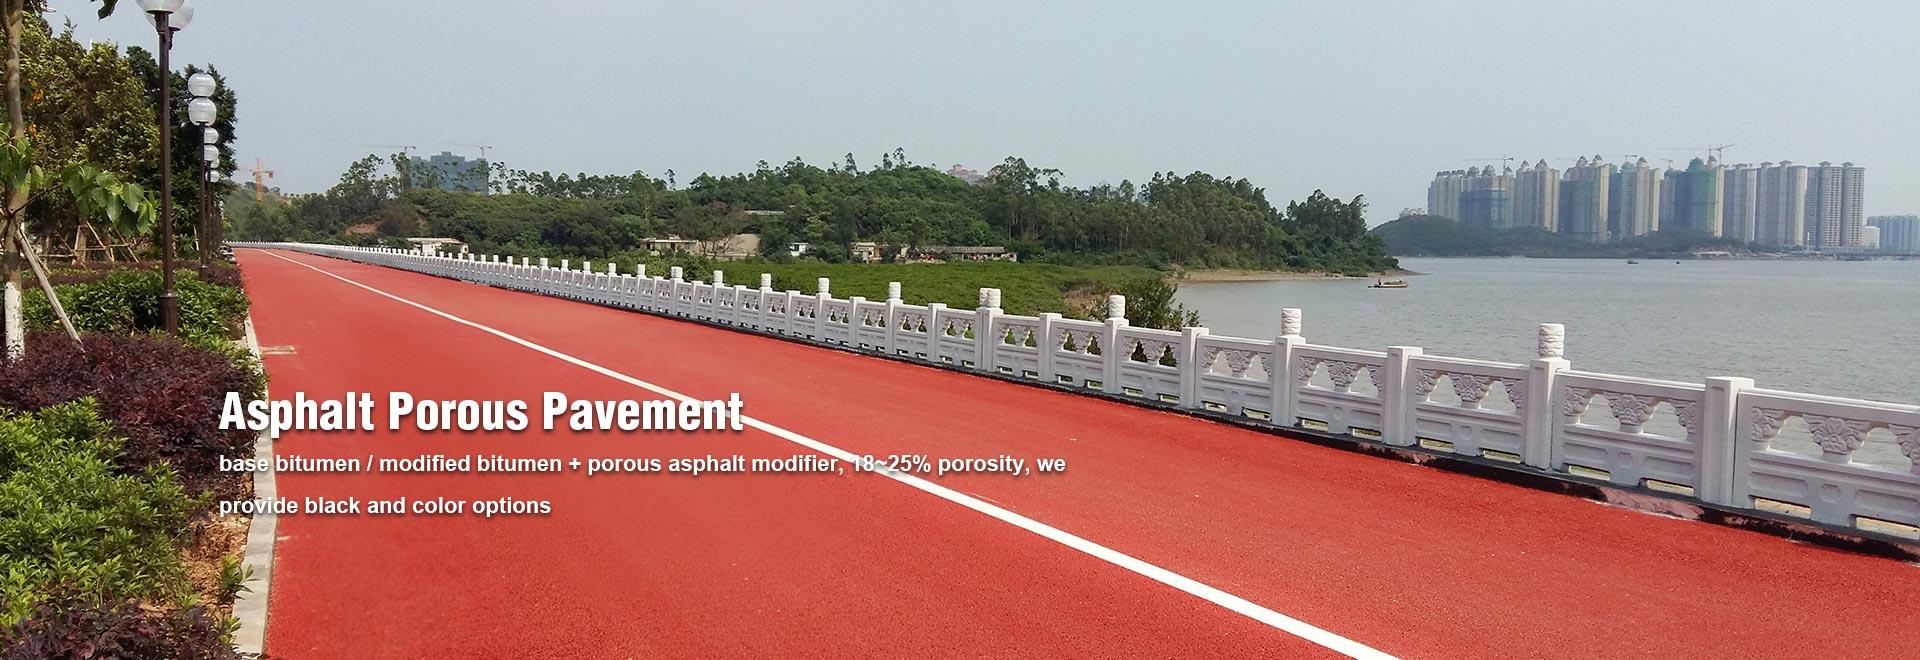 Black Asphalt Porous Pavement